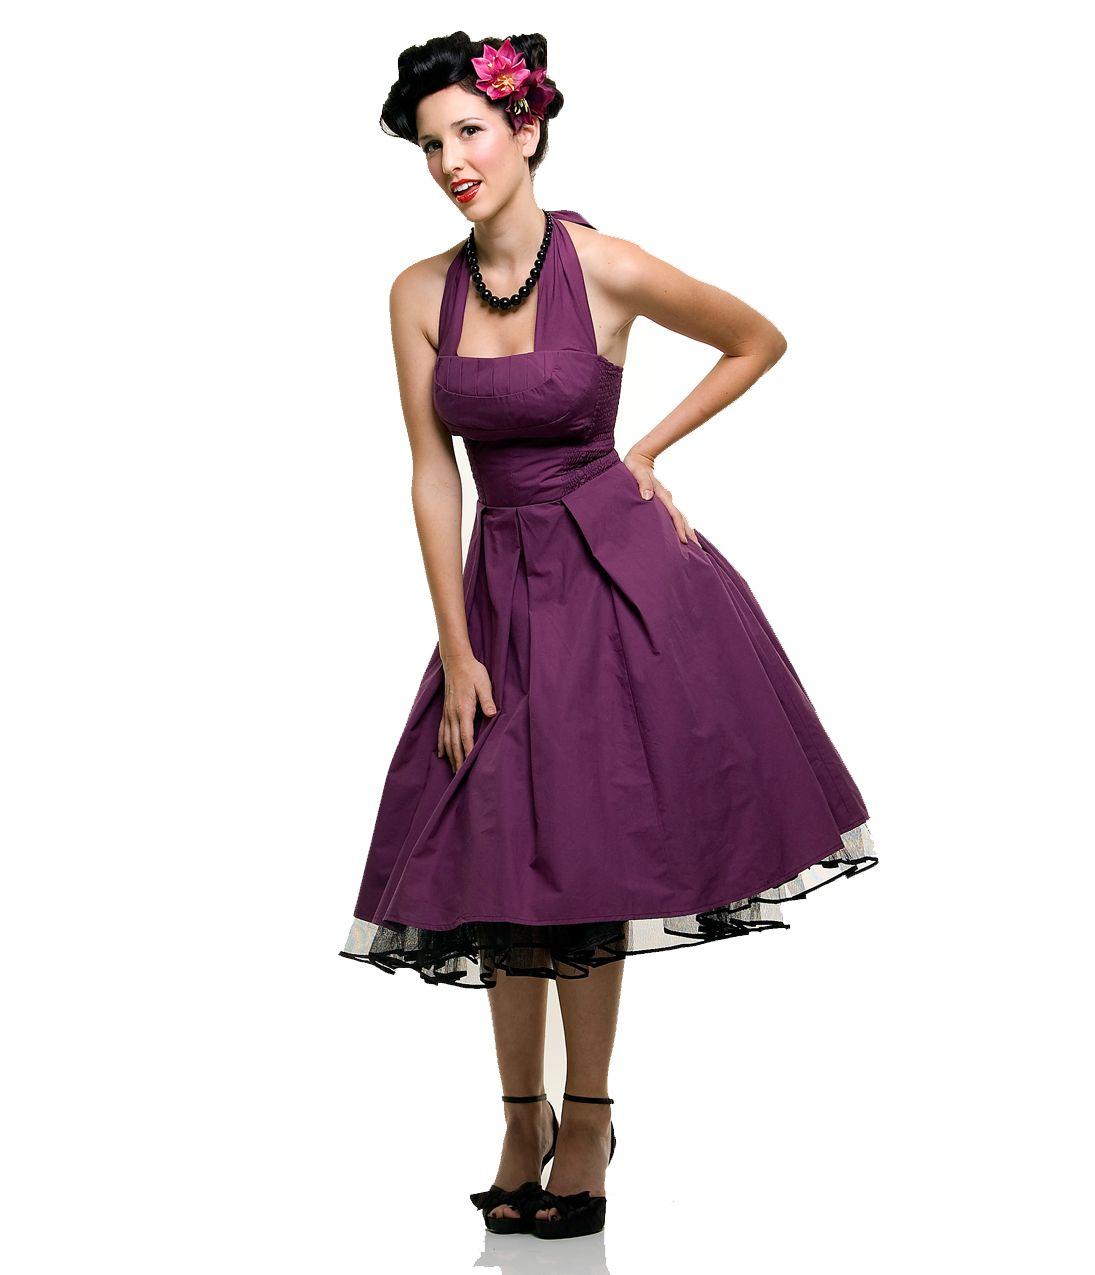 Matching bridesmaid dress? $98 Eggplant Flirty Cotton Swing Dress ...